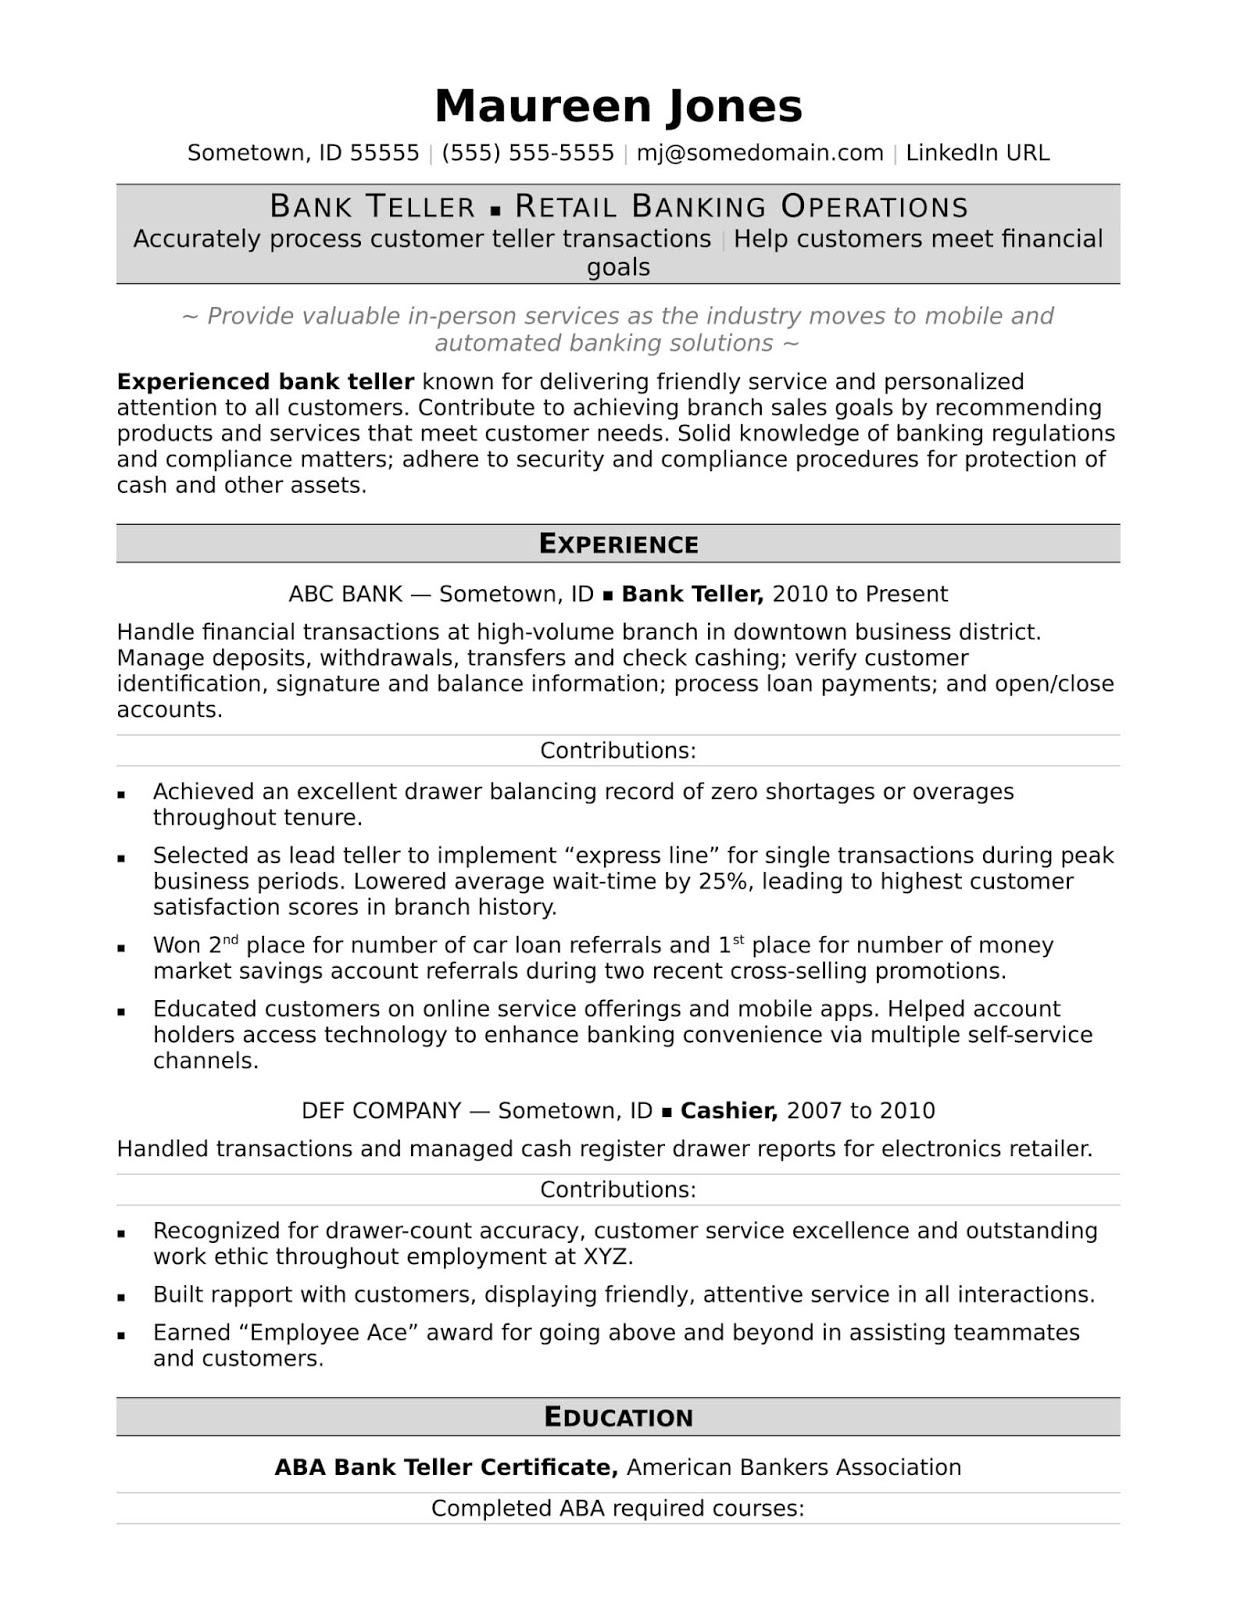 banker resume template Banker Resume Template 2019 Banker Resume Word 2020 investment banker resume template personal banker resume template professional banker resume template private banker resume template retail banker resume template relationship banker resume template business banker resume template